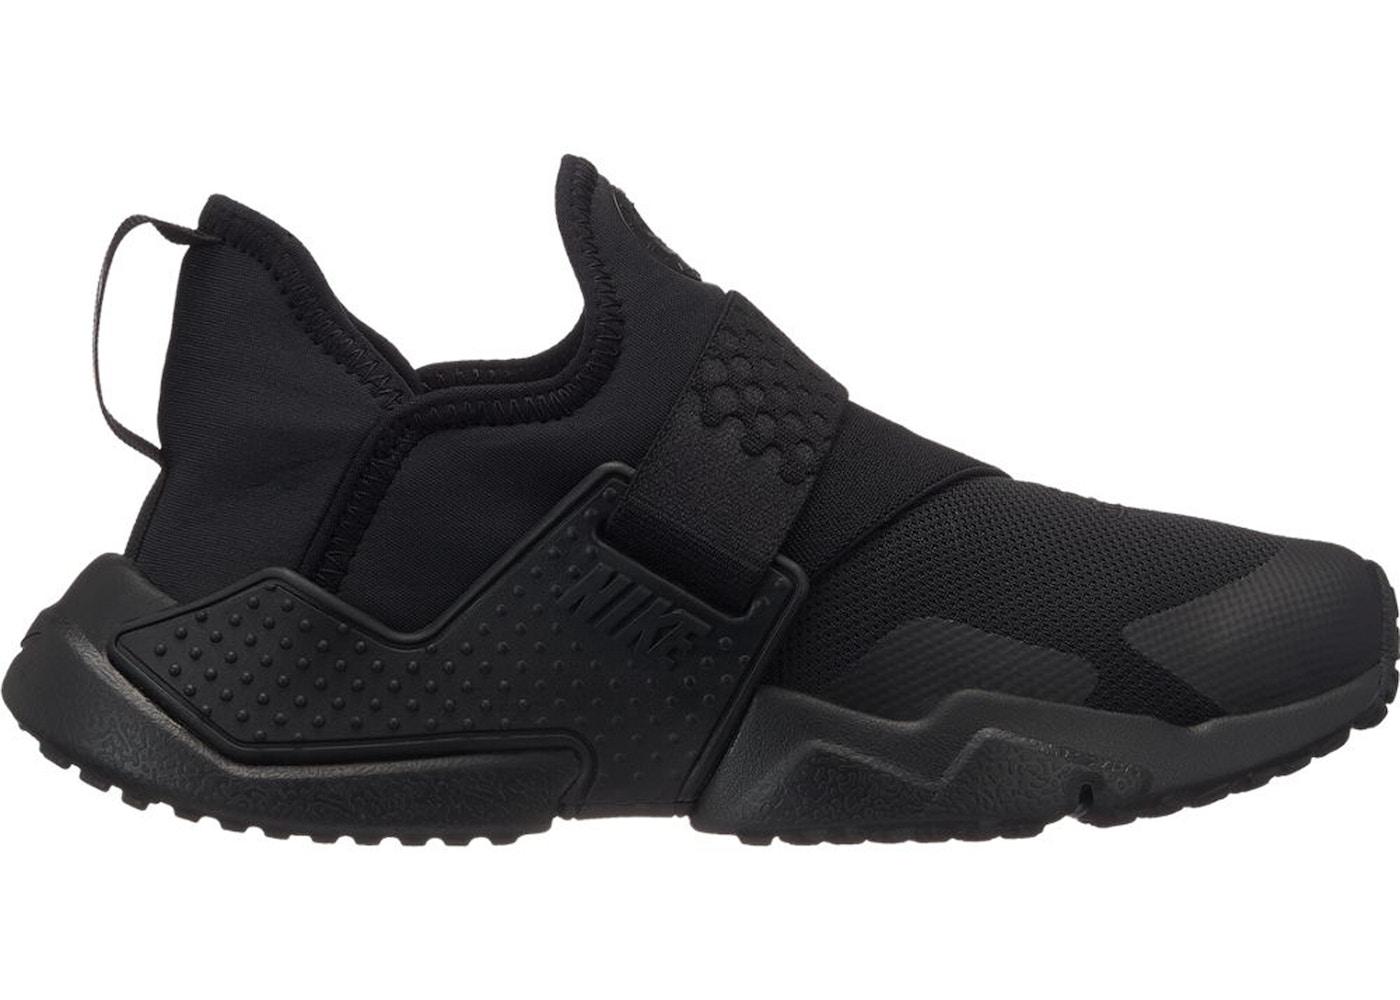 the best attitude cc6d2 58bab Nike Huarache Extreme Triple Black (GS) - AQ0575-004